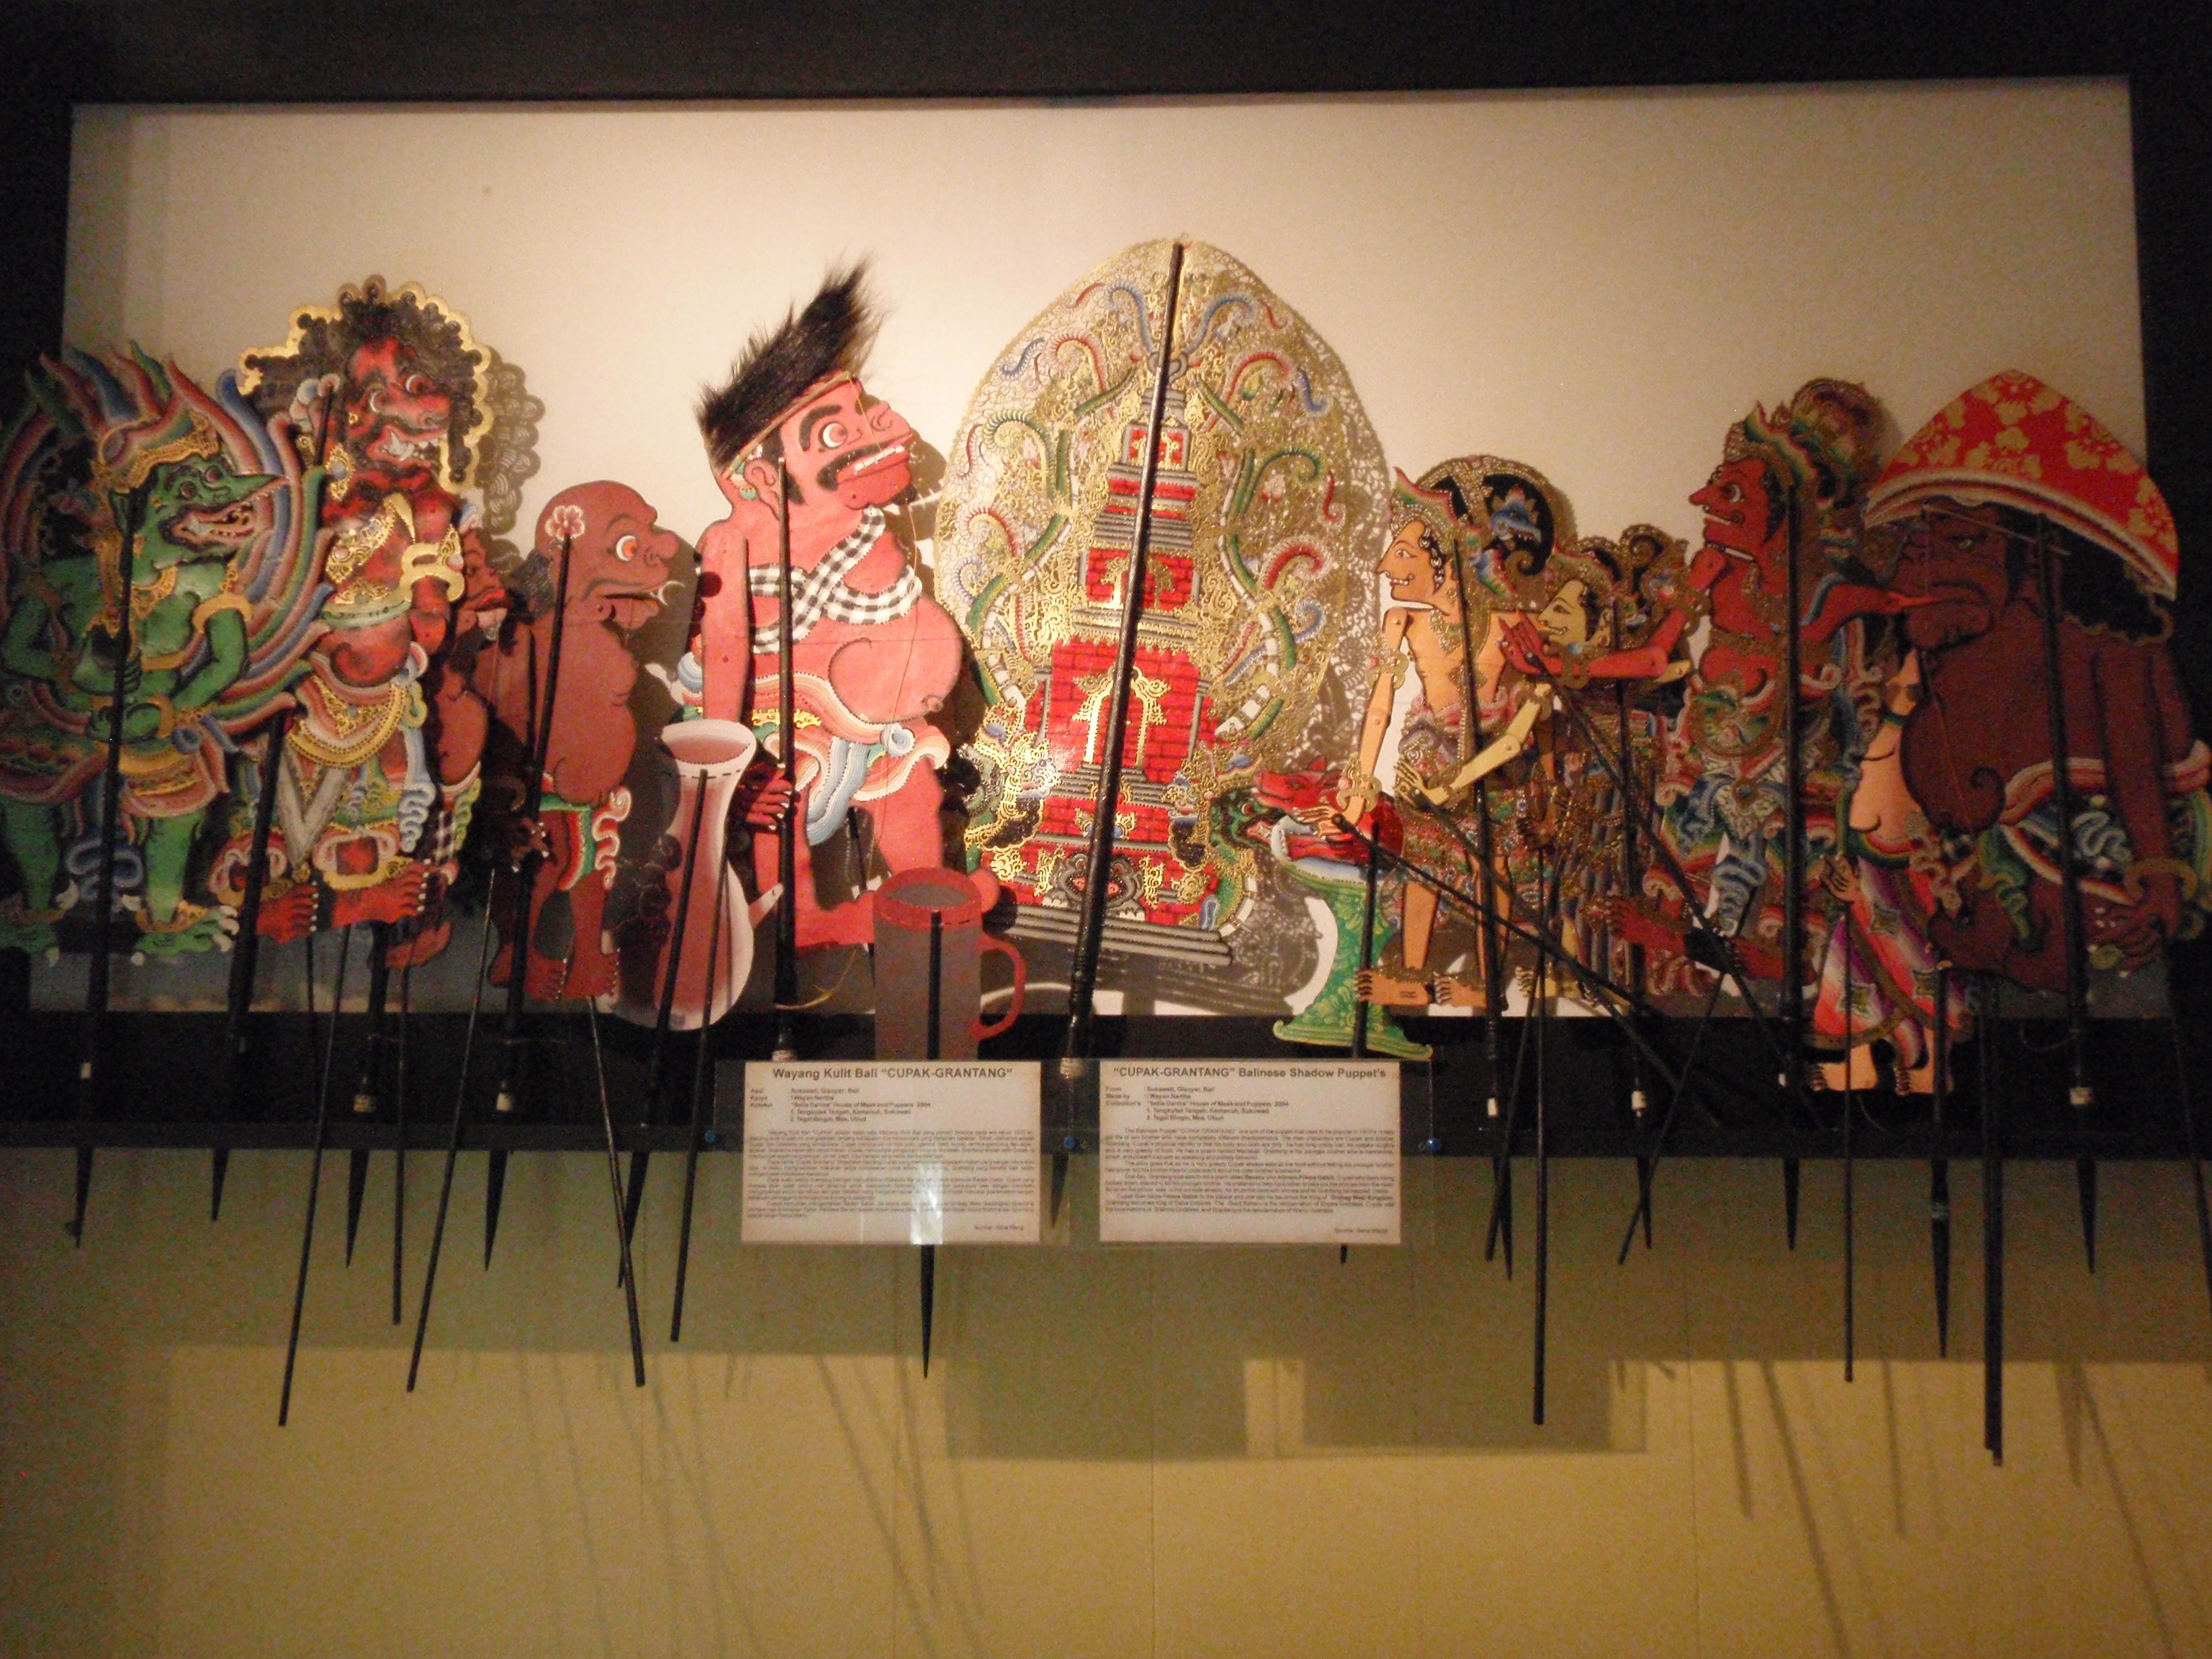 Wayang <em>kulit</em> Cupak Grantang (Bali) raconte l'histoire de Cupak et Grantang, deux fils de Bathara Brahma, créateur du wayang : I Wayan Nartha (Sukawati, Gianyar, Bali). Collection : Setia Darma House of Masks and Puppets, Gianyar, Bali, Indonésie.